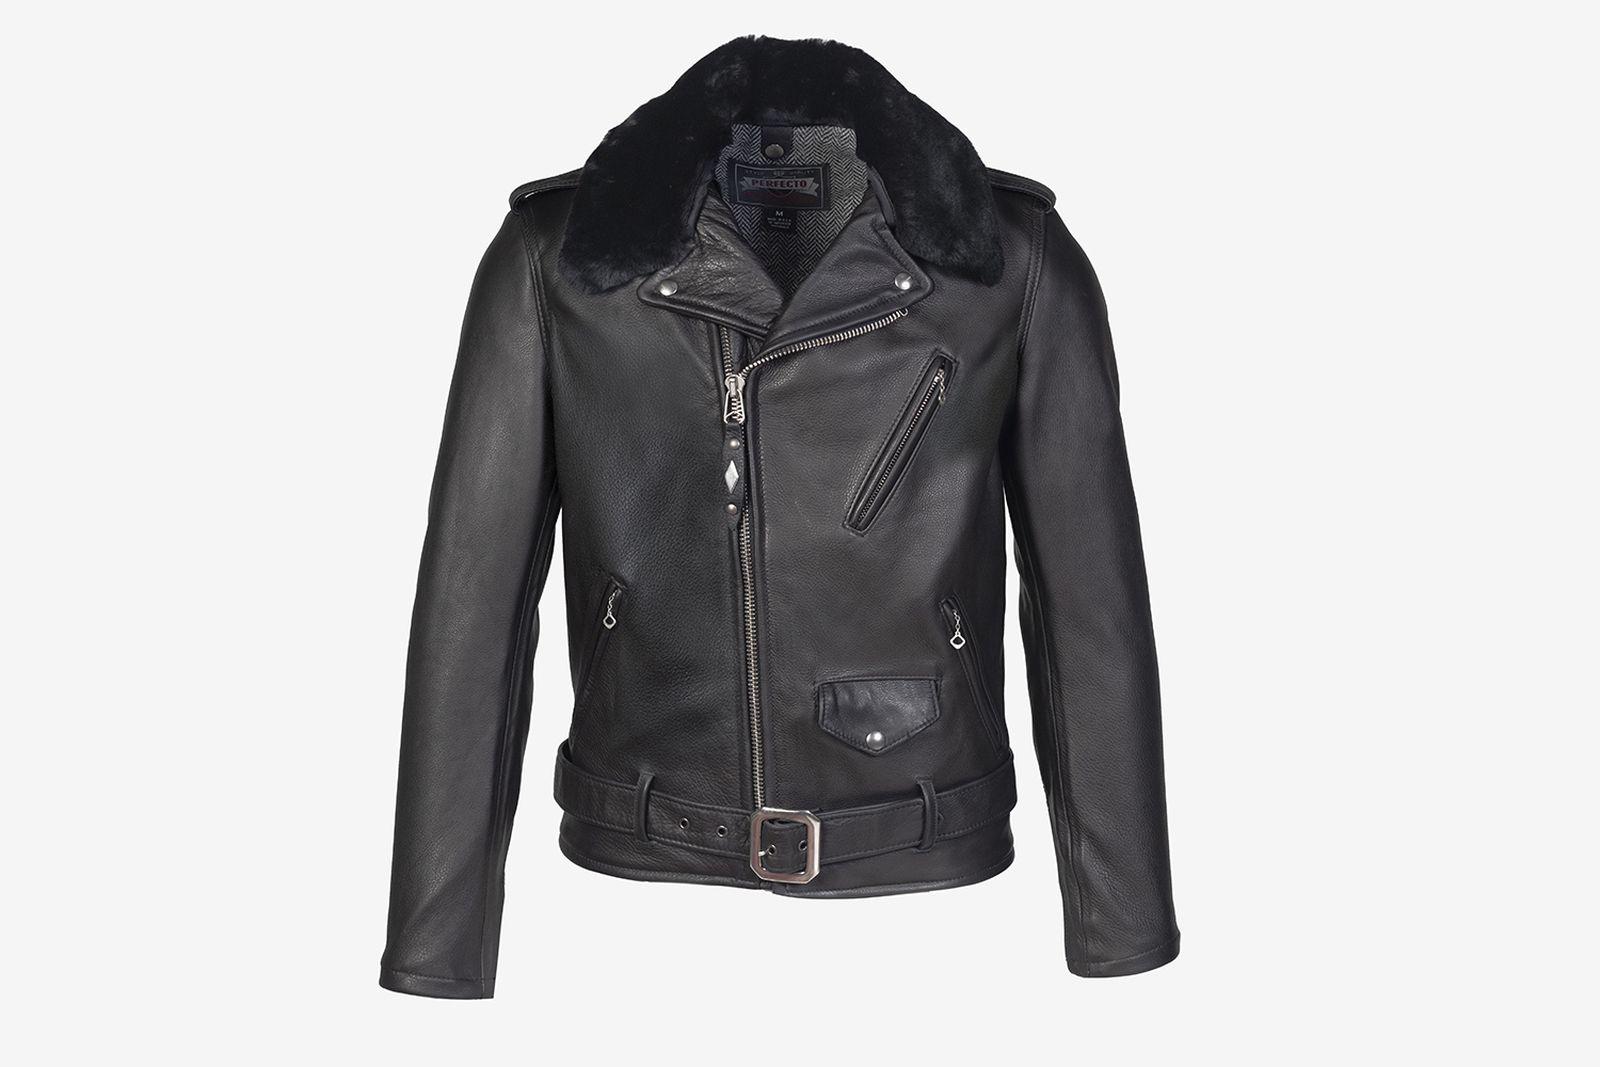 schott nyc perfecto jacket 90th anniversary